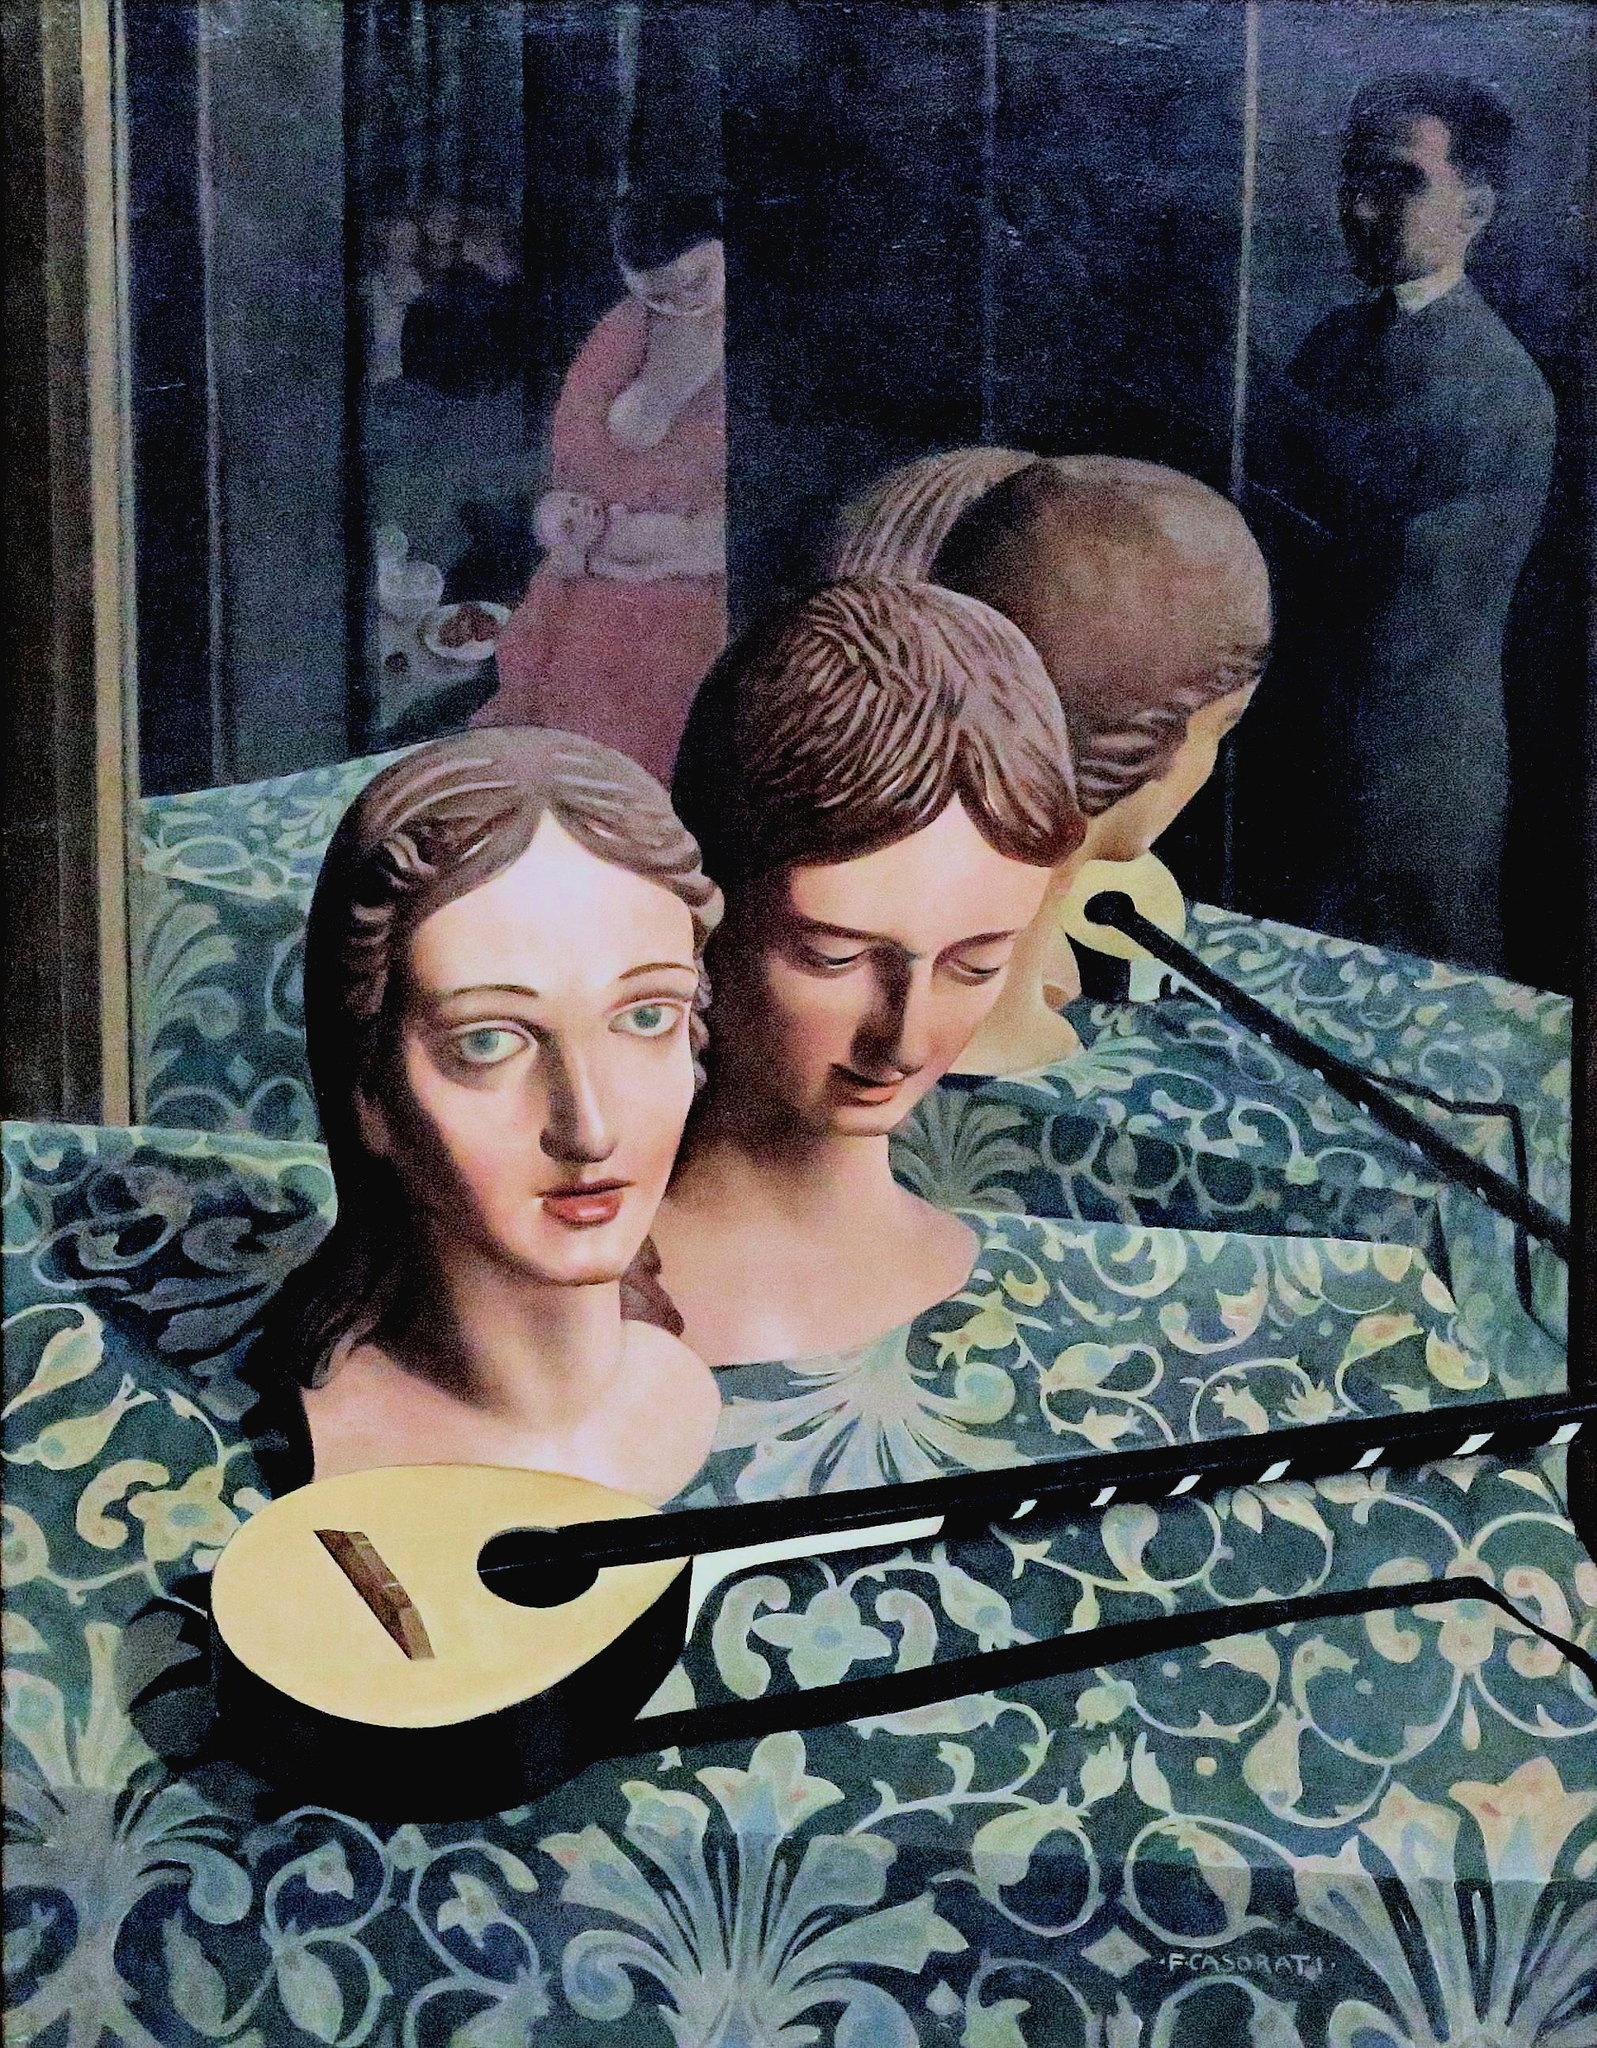 casorati felice 1924 mannequins Museo del Novecento Milan photo jean louis mazieres